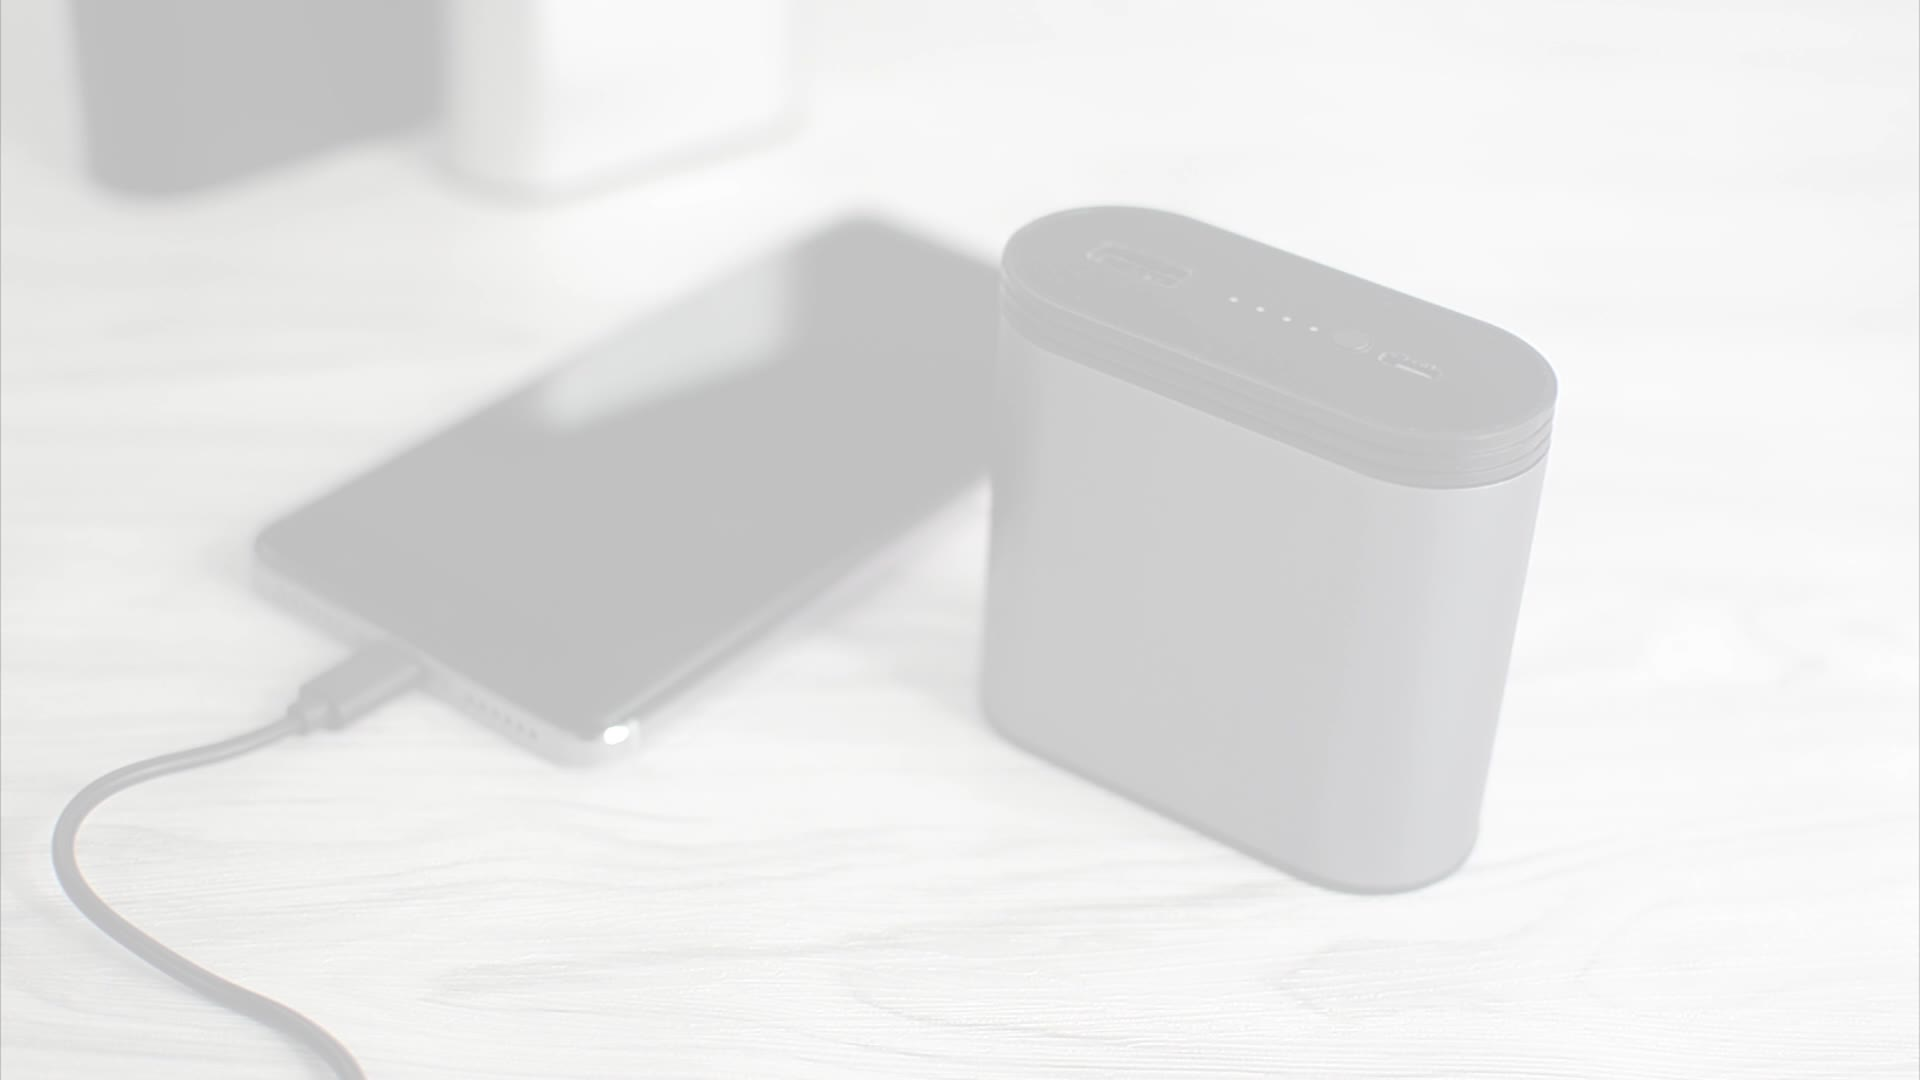 New True Wireless Earphones BT Earbuds with Charging Case Power Bank